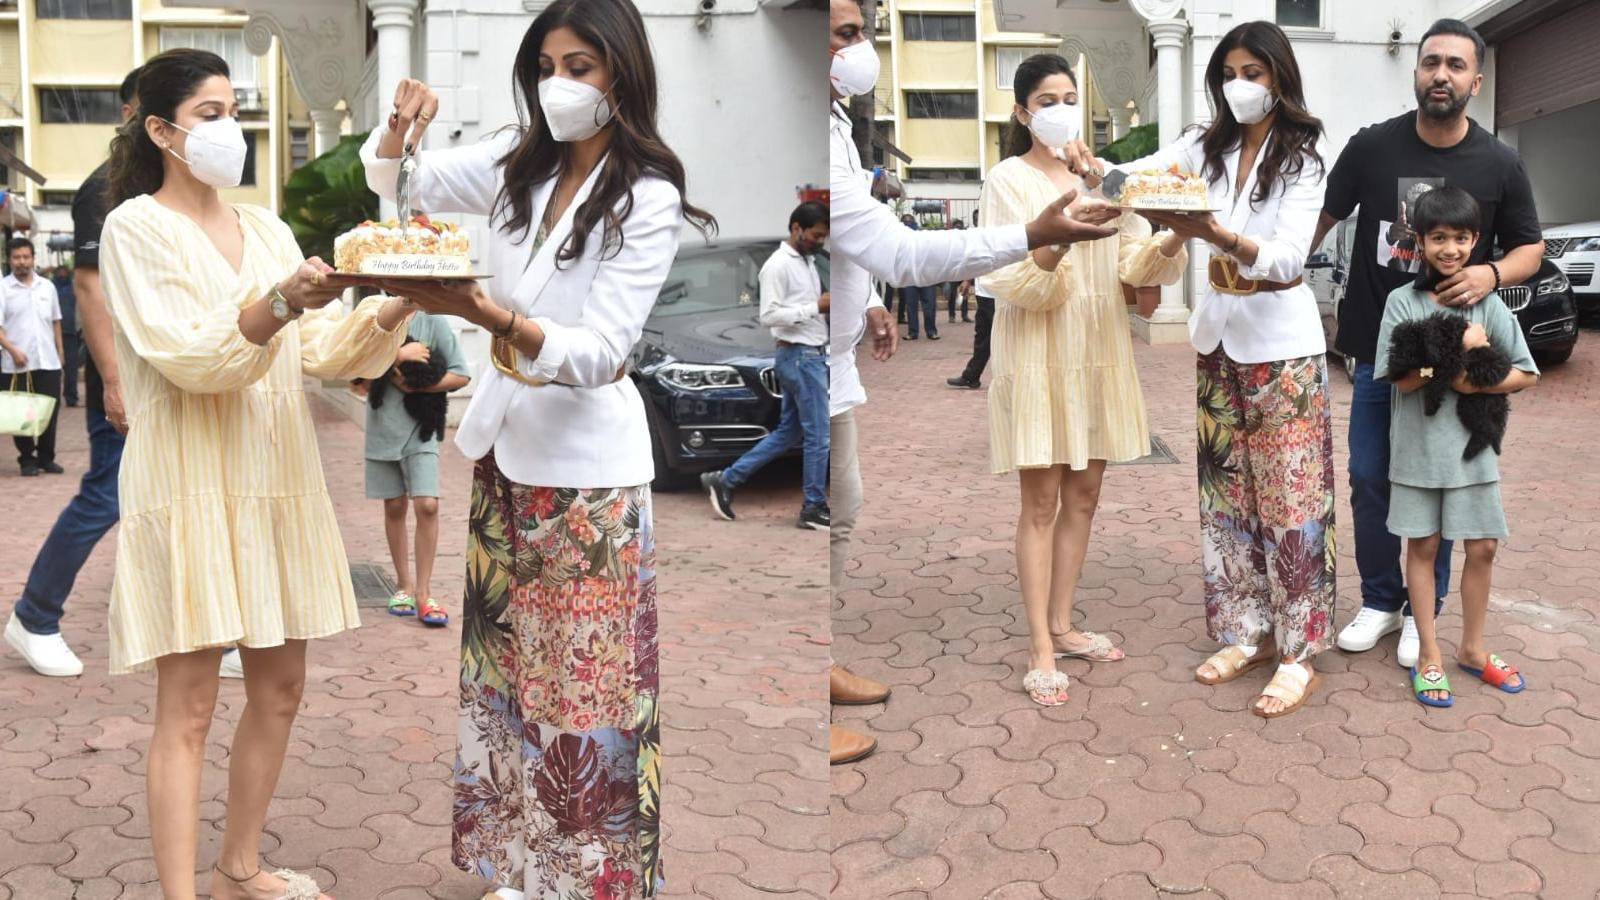 Shilpa Shetty celebrates birthday with paparazzi; cuts cake | Hindi Movie News – Bollywood – Times of India